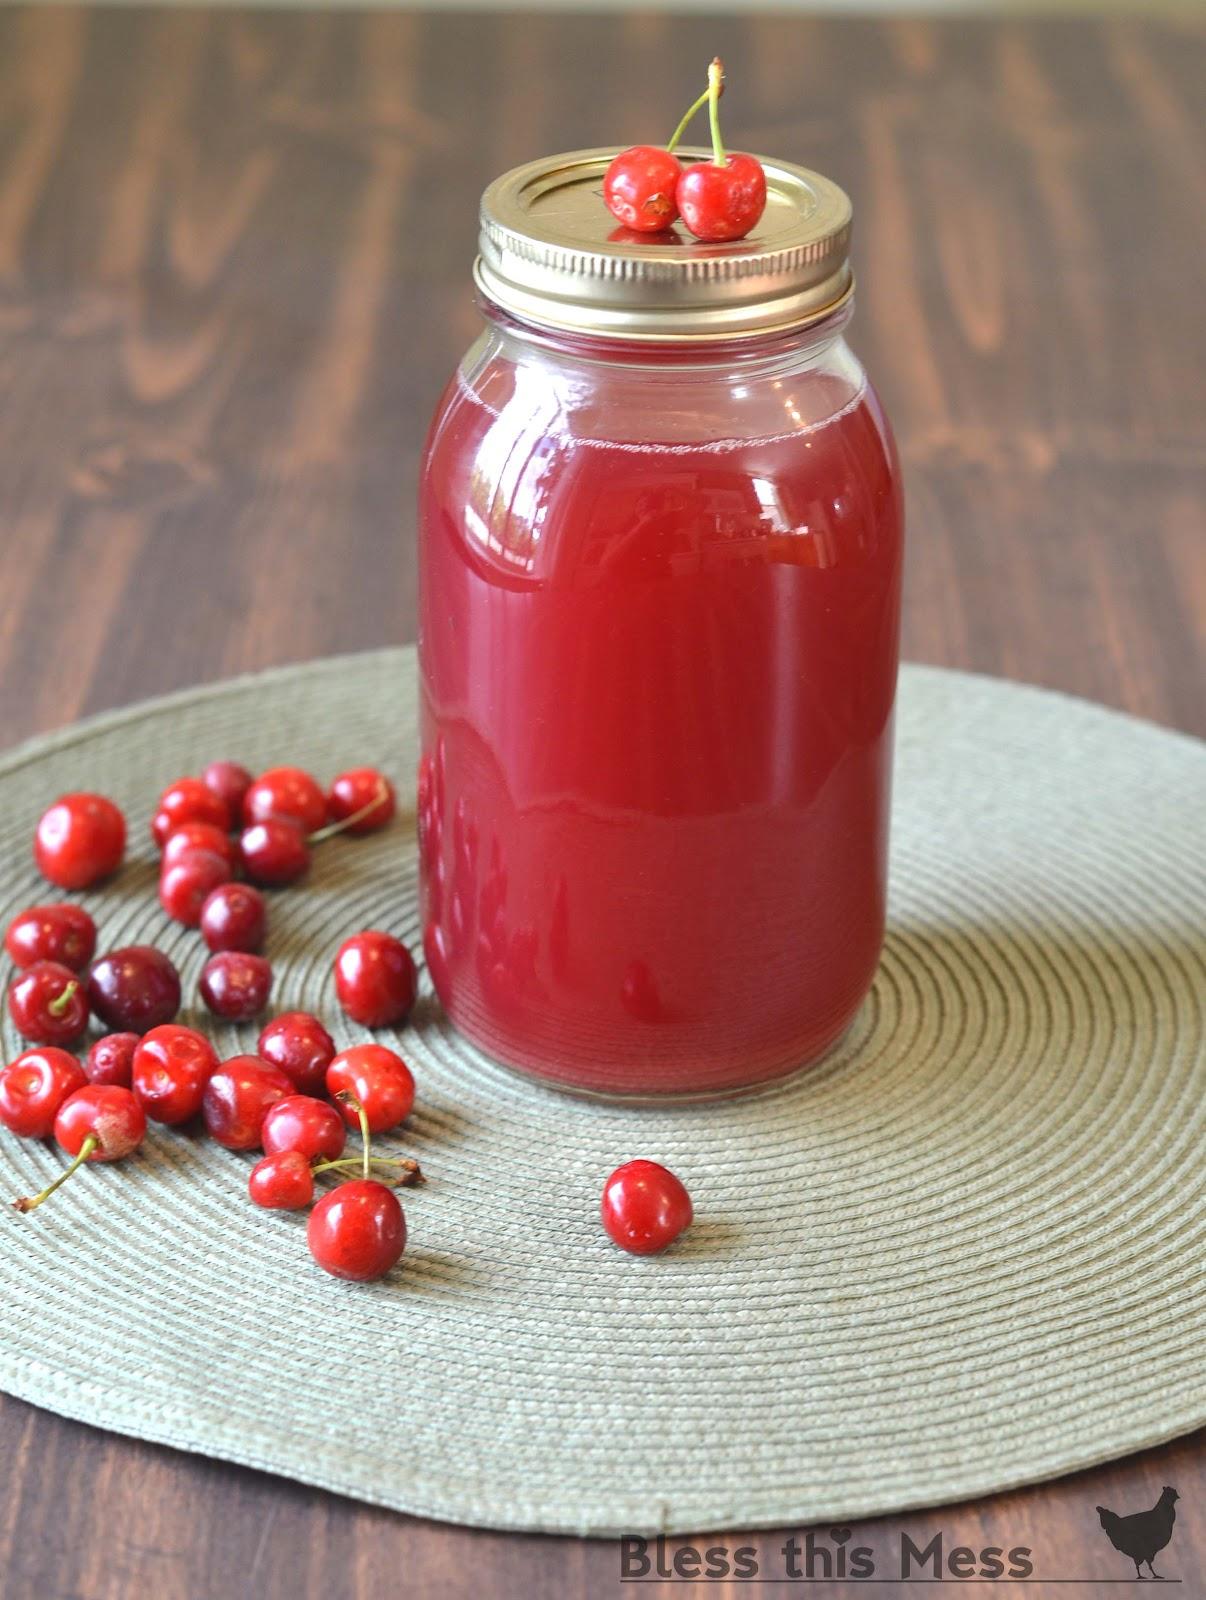 How to make homemade juice 79